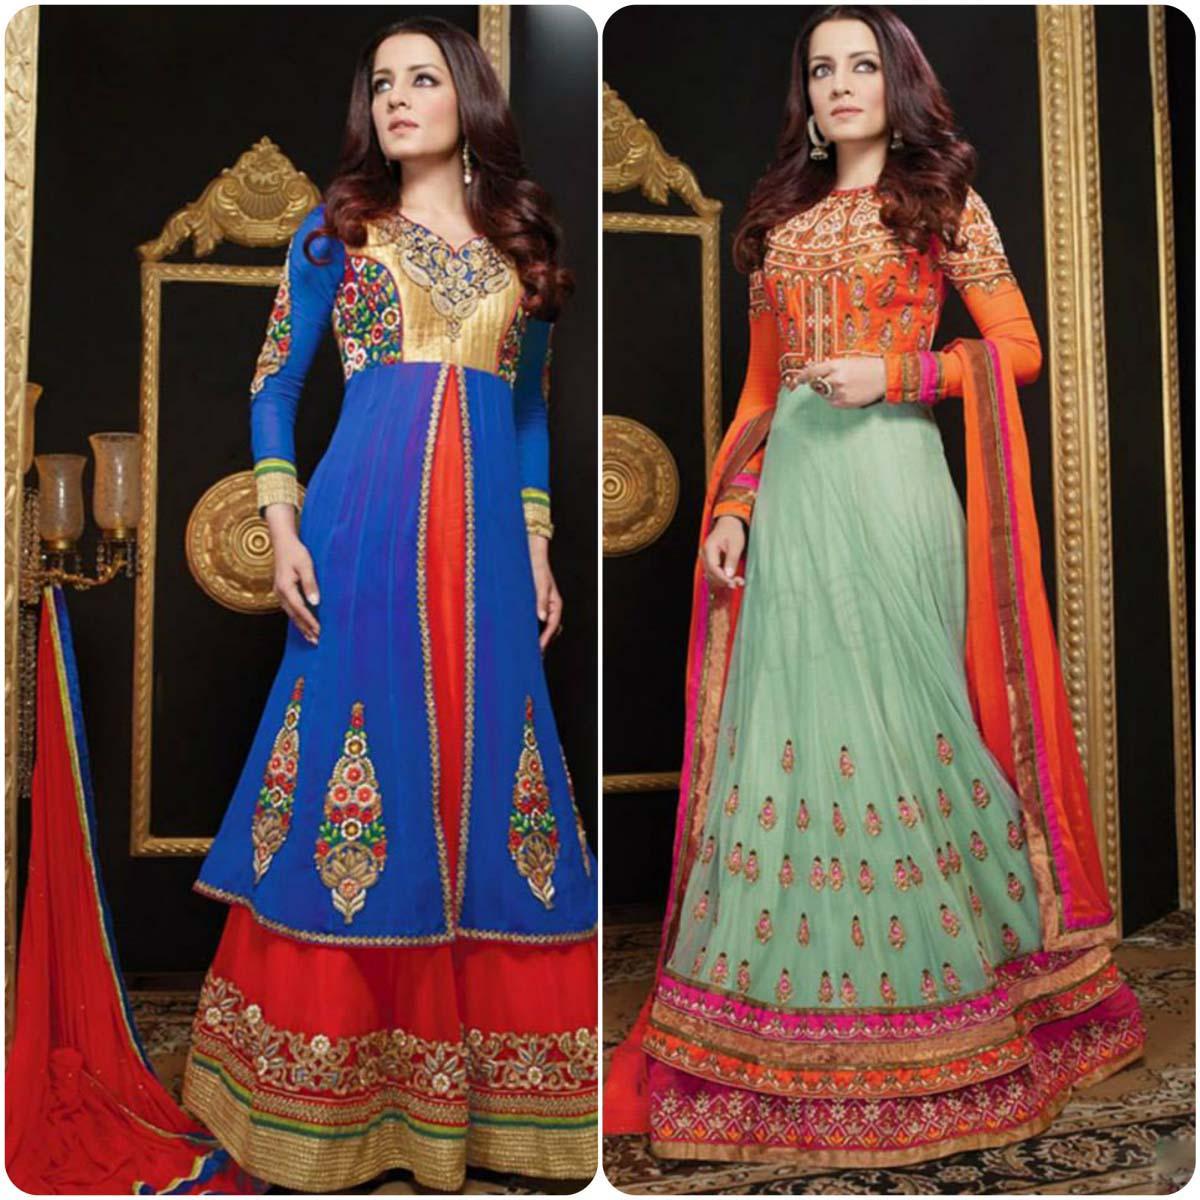 Natasha Couture Latest Indian Anarkali Dress Desigs Collection 2016-2017...styloplanet (6)